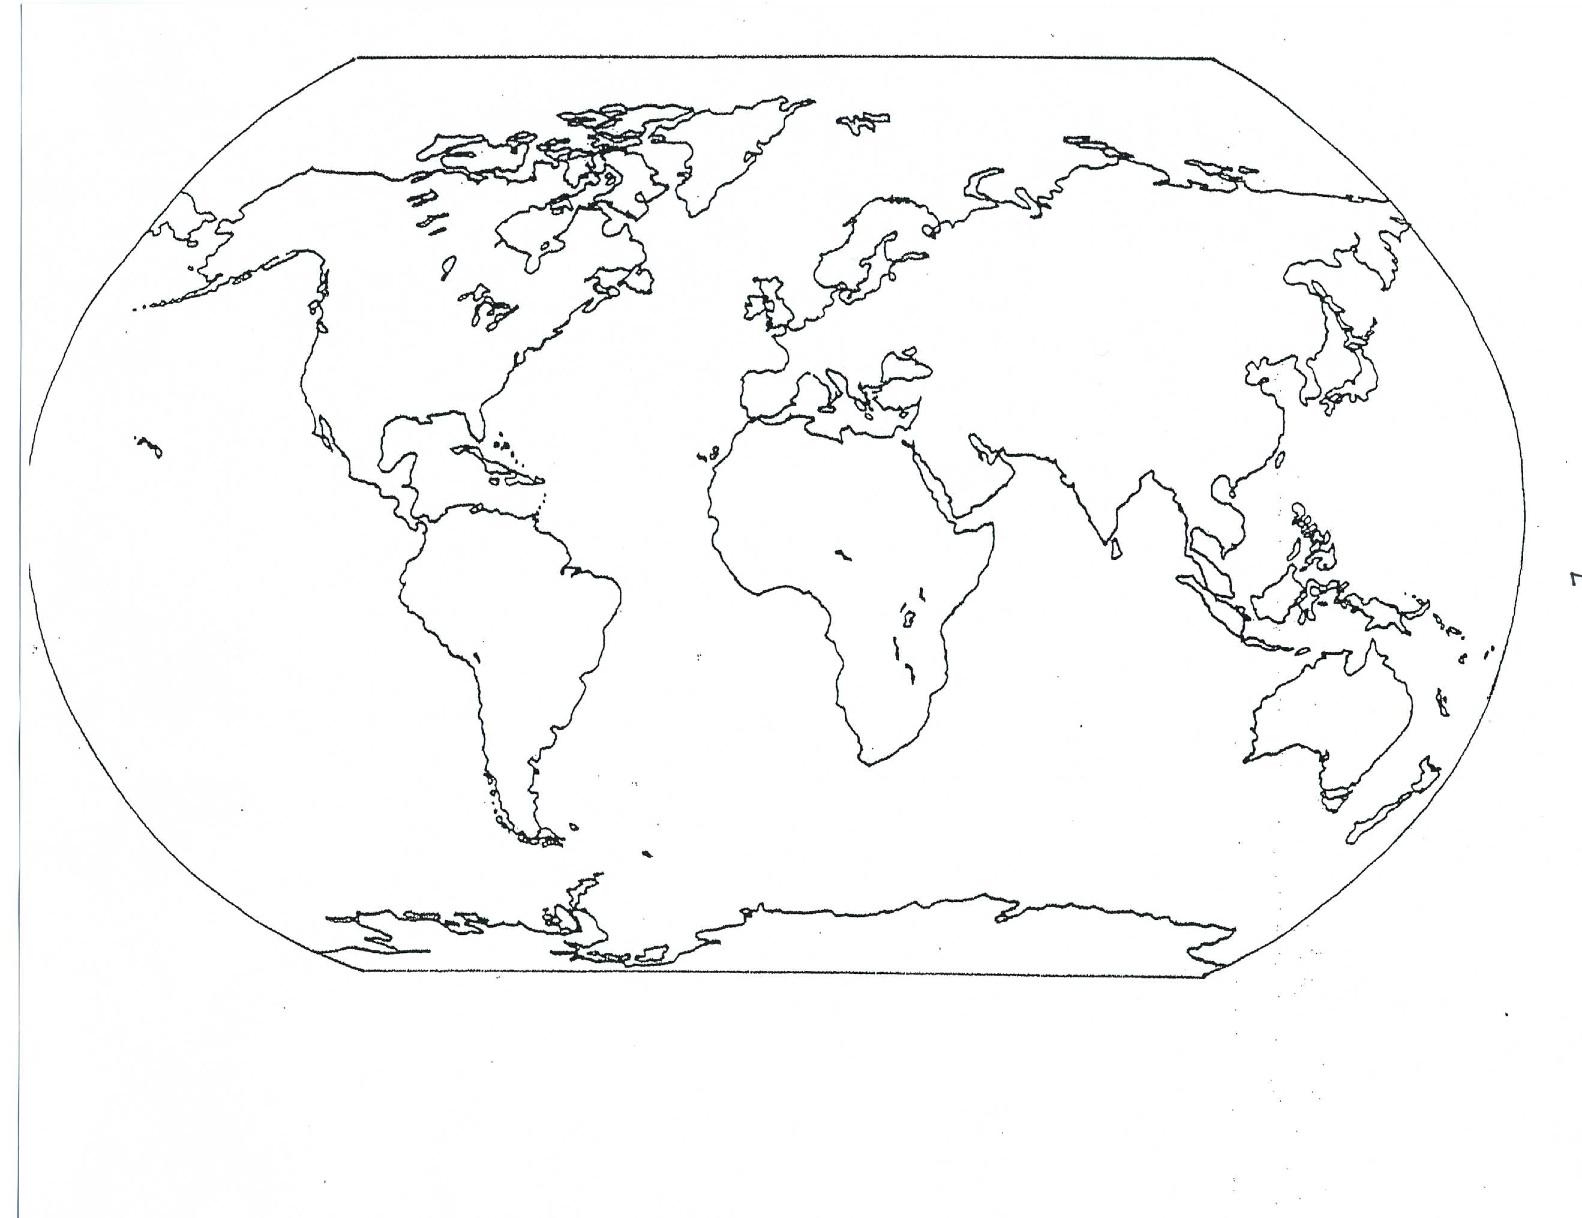 Blank Map Of Continents Blank Map Of Continents And Oceans   Laserexcellence Blank Map Of Continents